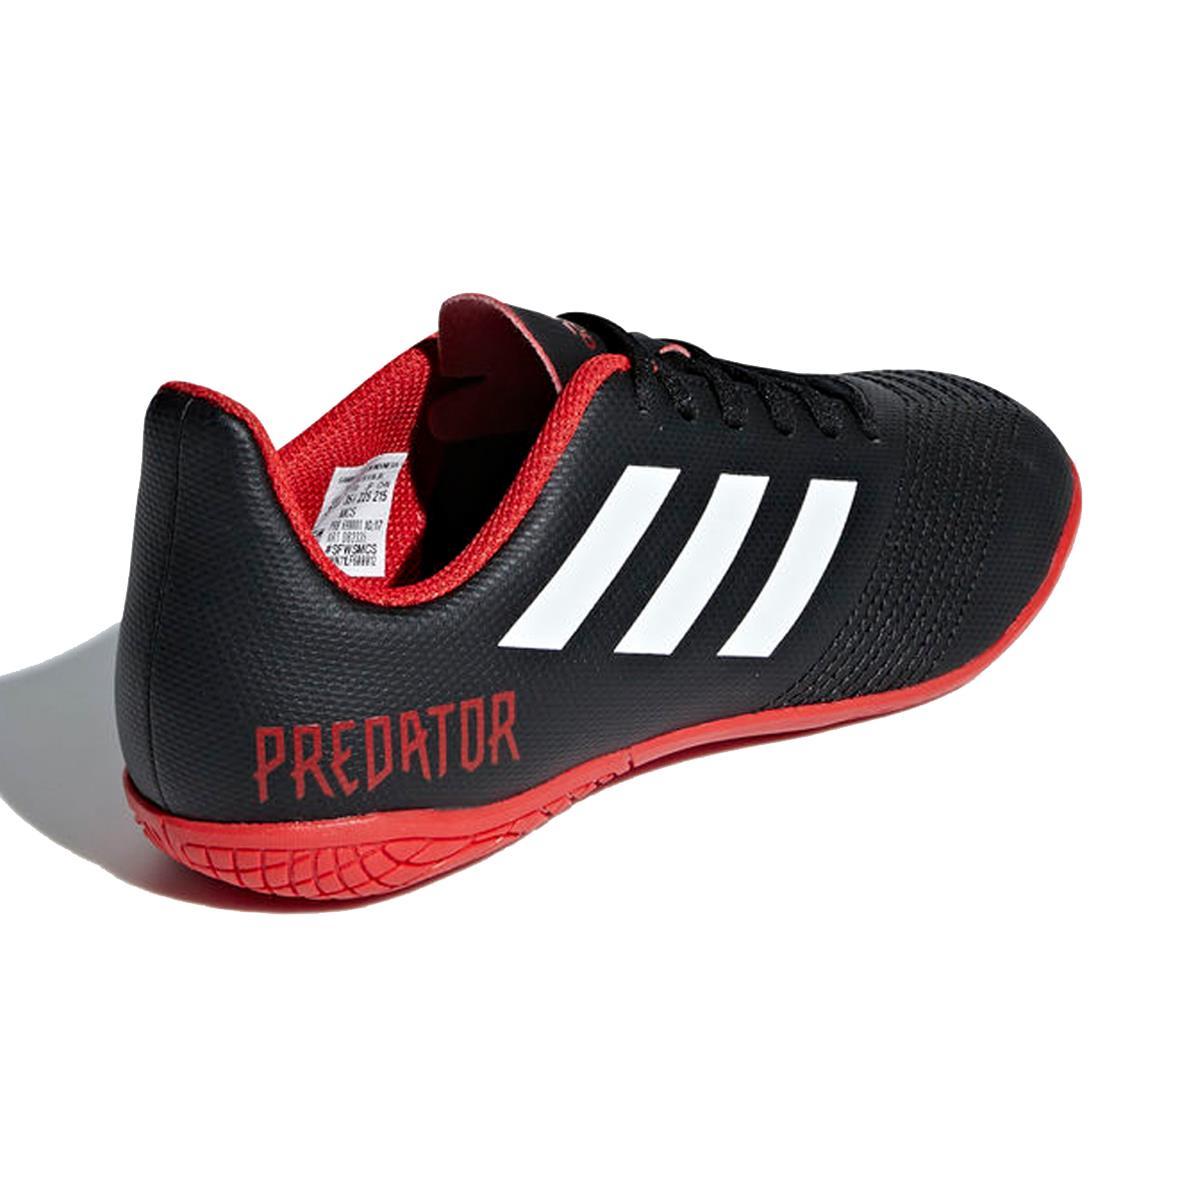 d93c38102d Chuteira Futsal Adidas Predator Tango 18.4 Infantil Preta